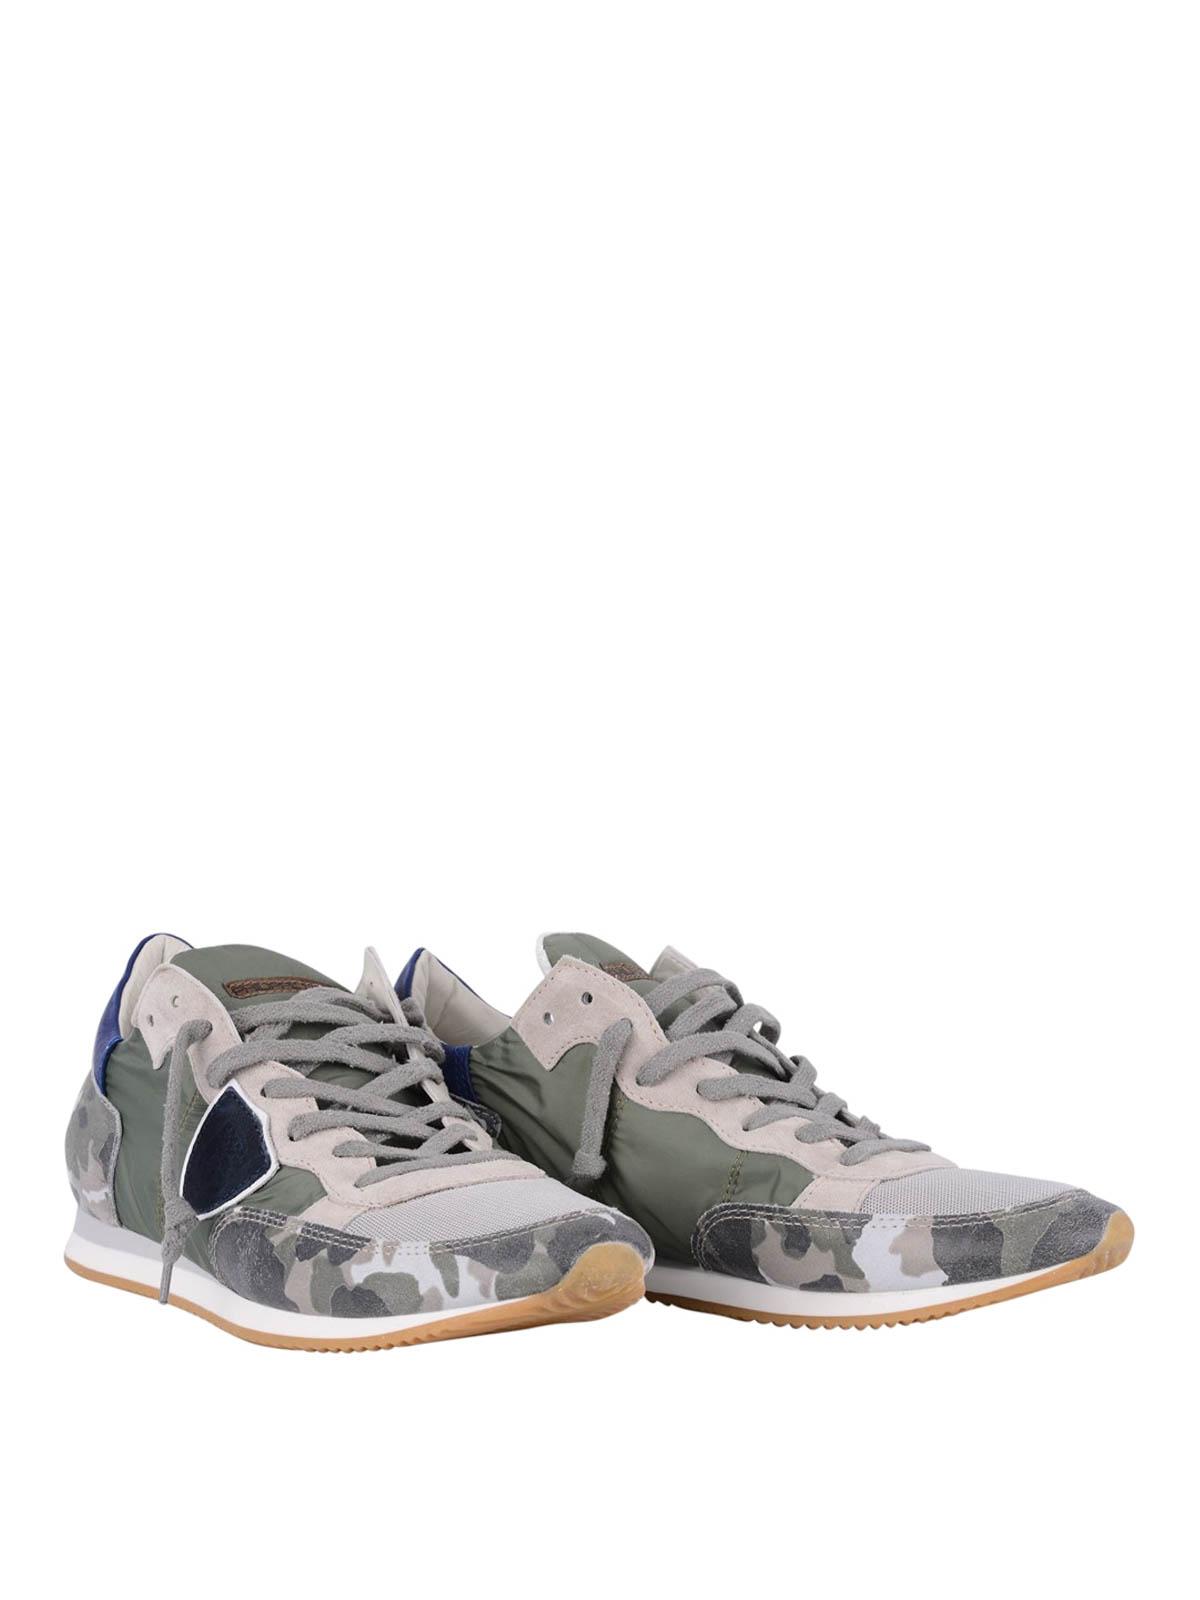 2f02c42254b4 Philippe Model - Tropez camouflage print sneakers - trainers - TRLU CX03